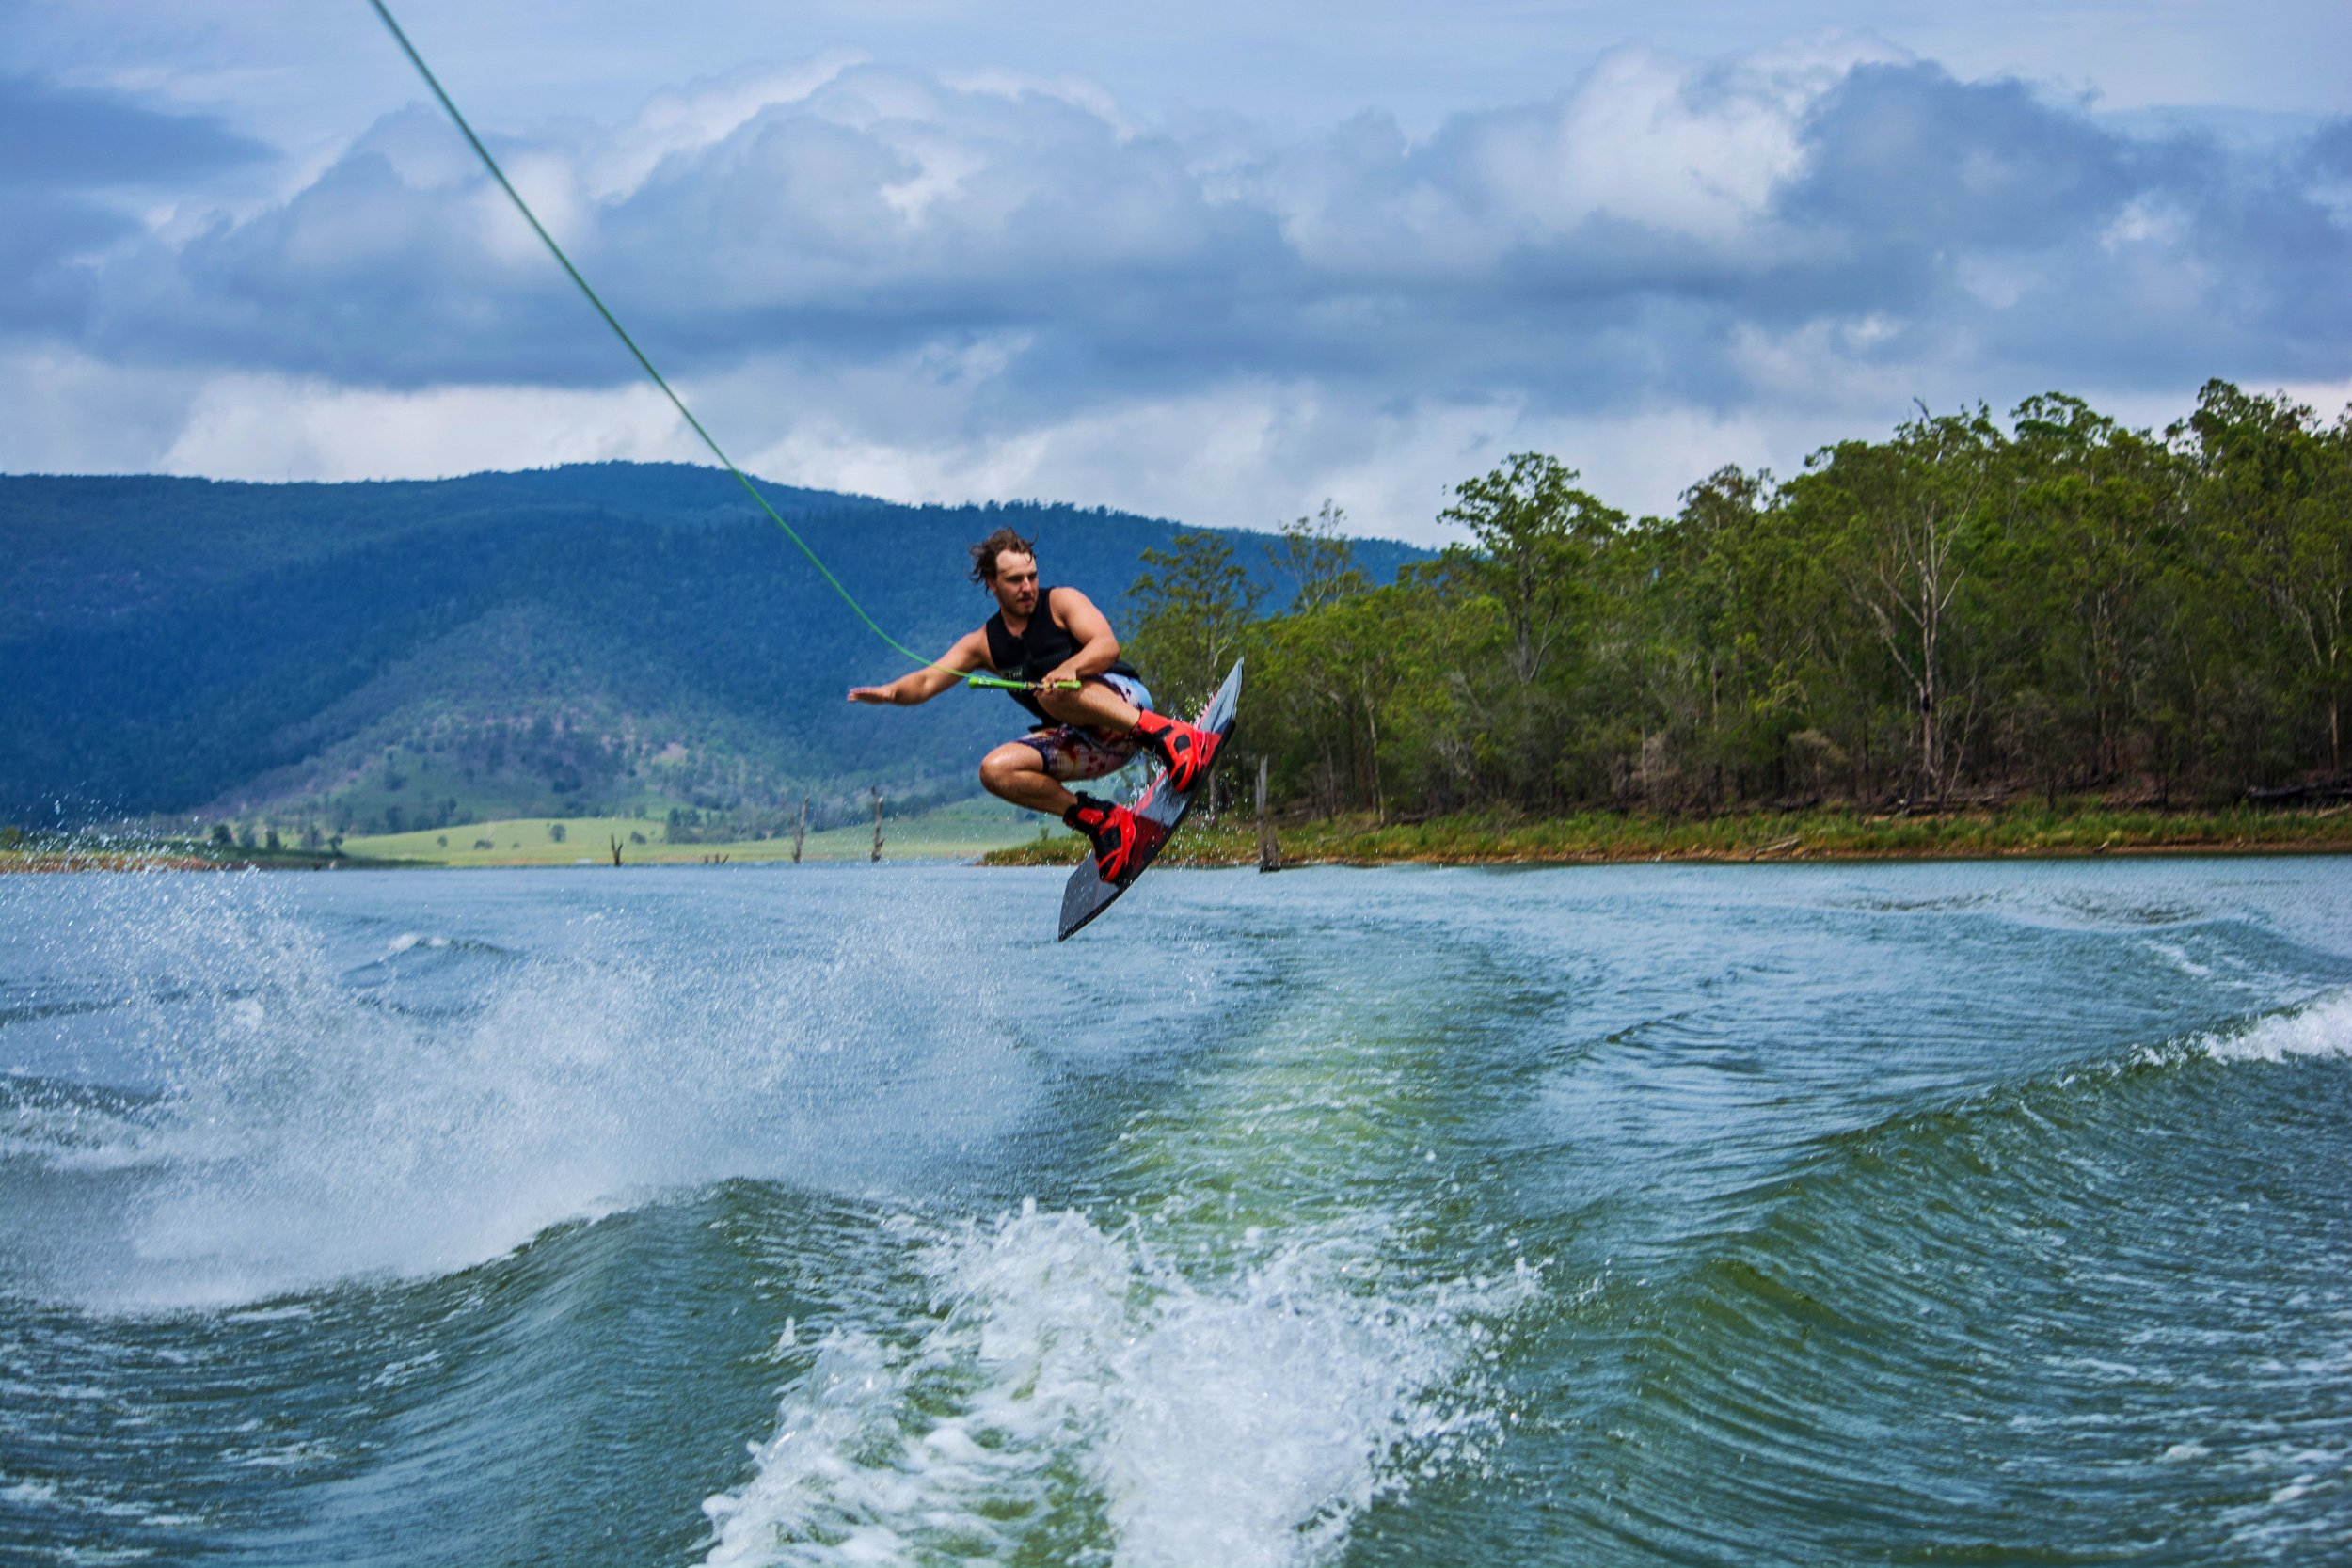 Water skiing on a lake.